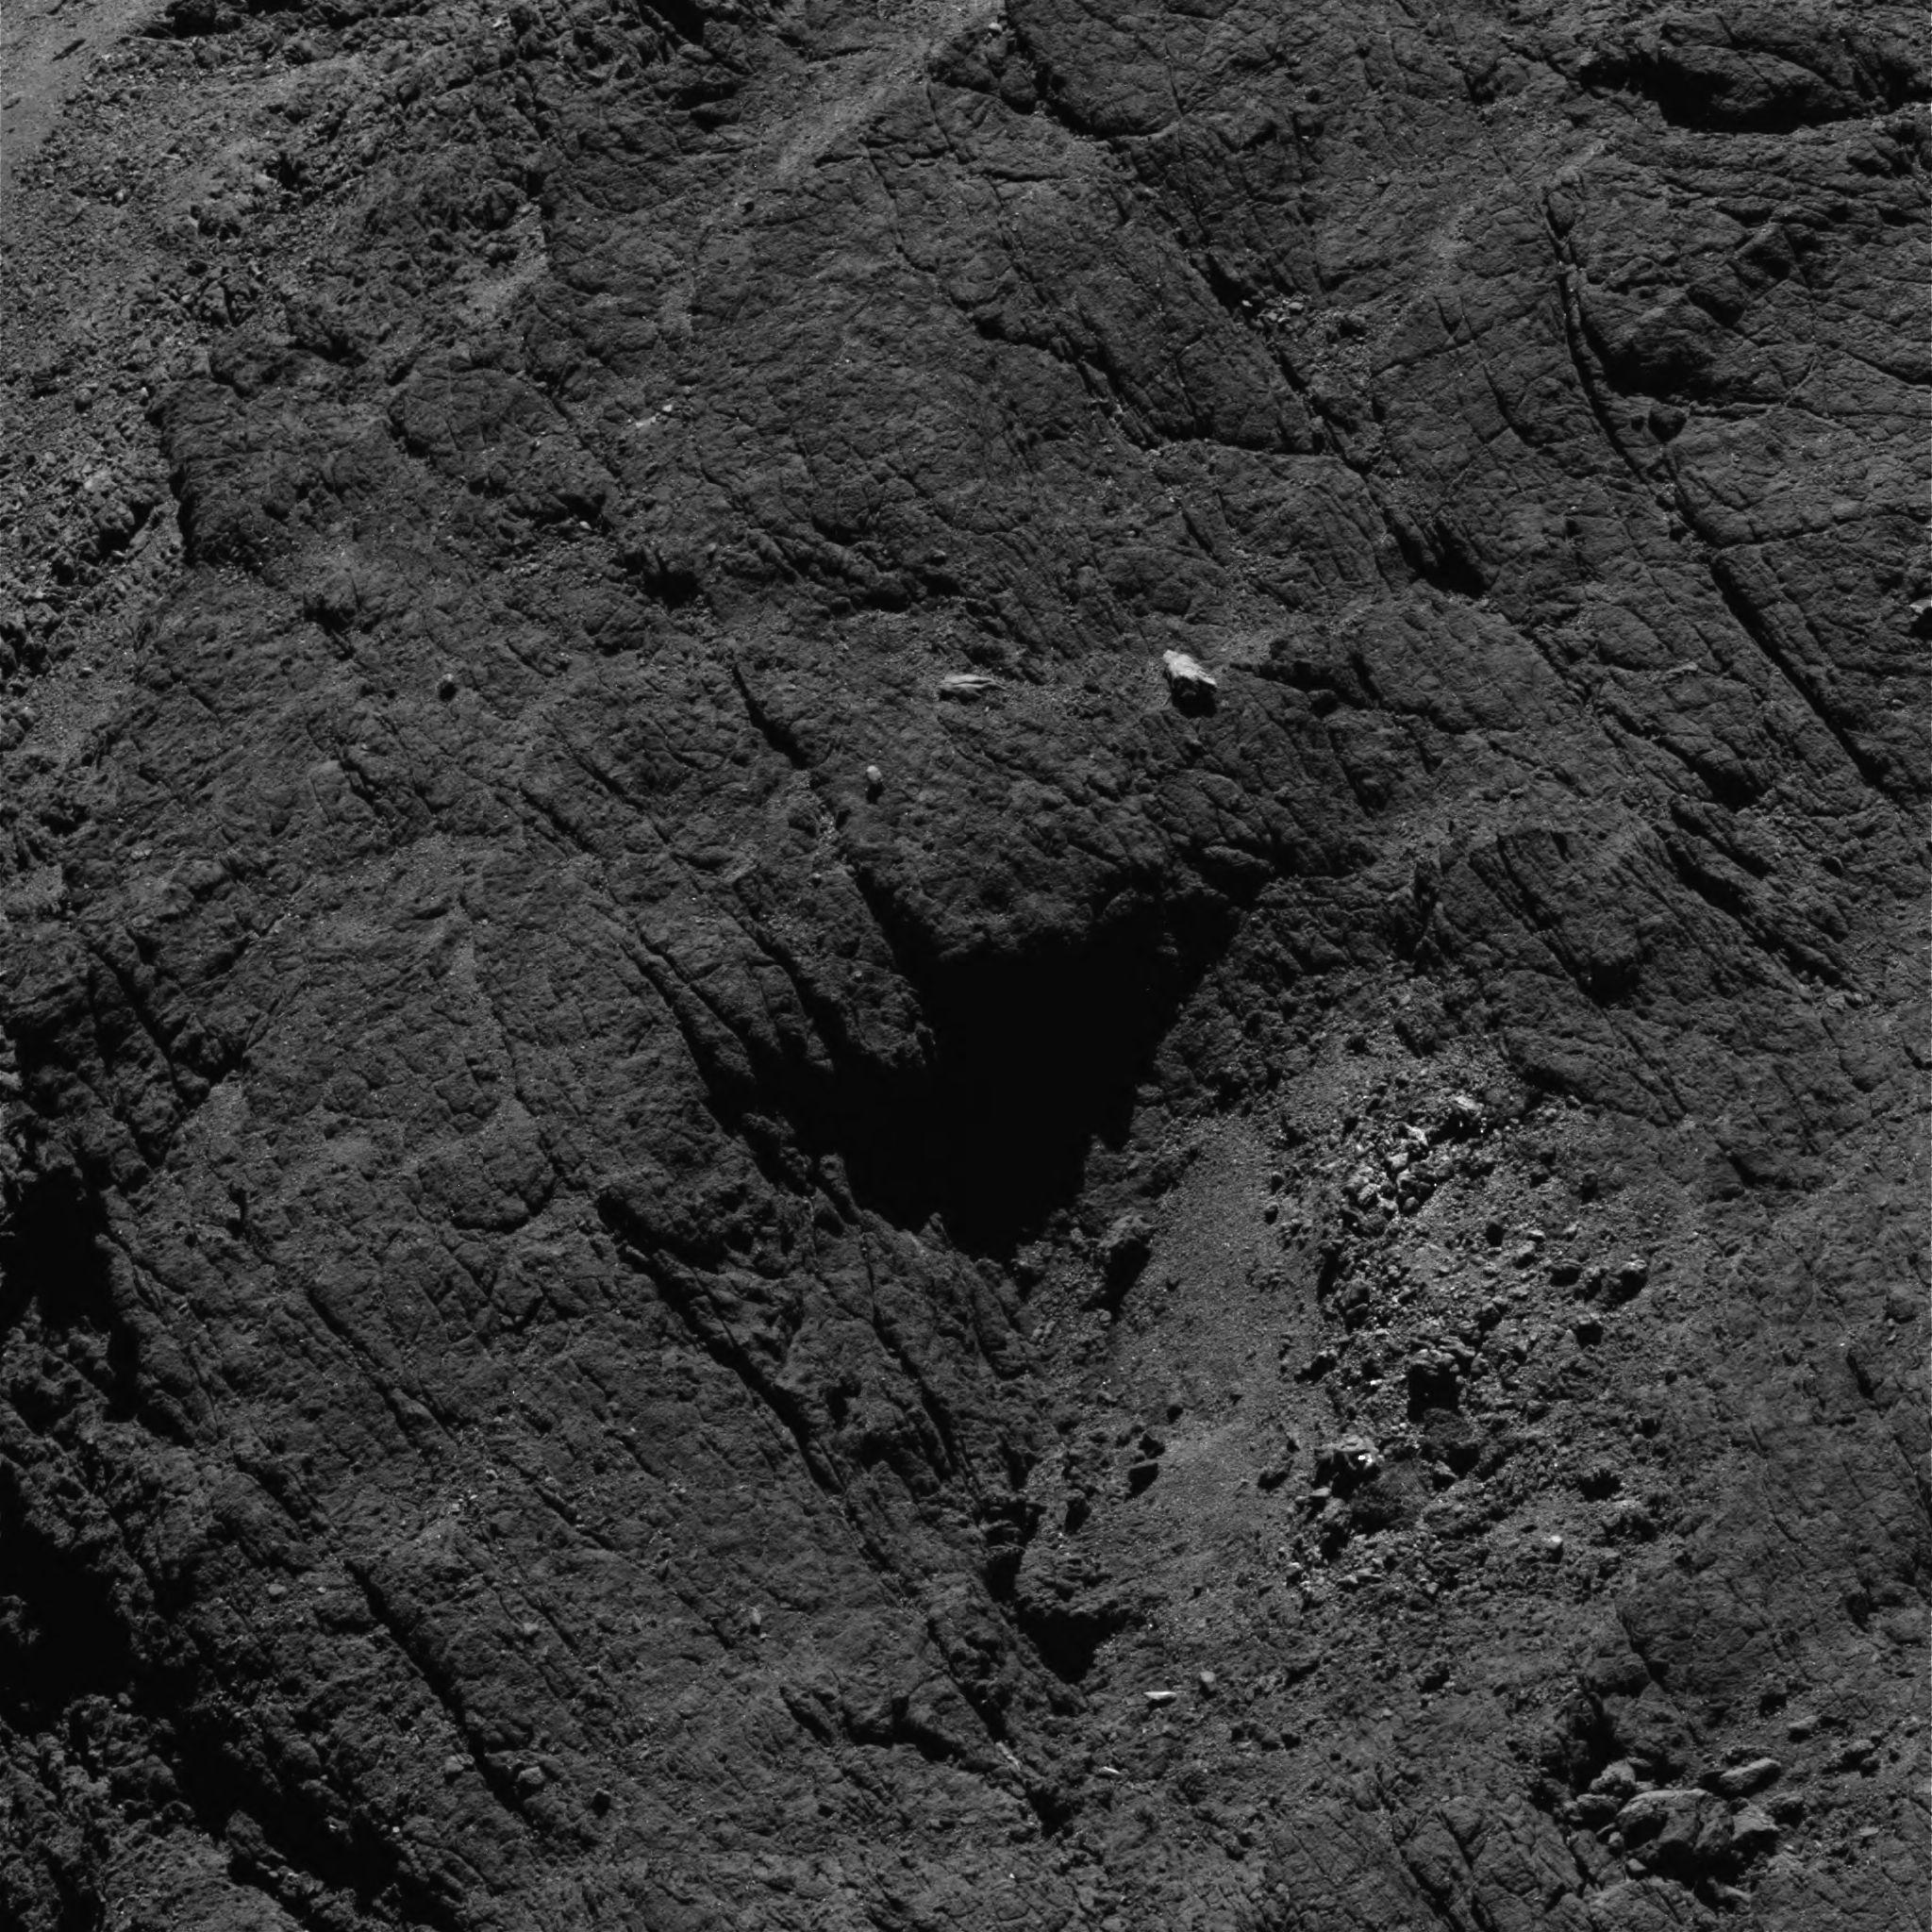 1567215488577-Rosetta_OSIRIS_NAC_comet_67P_20160806T022334.jpg